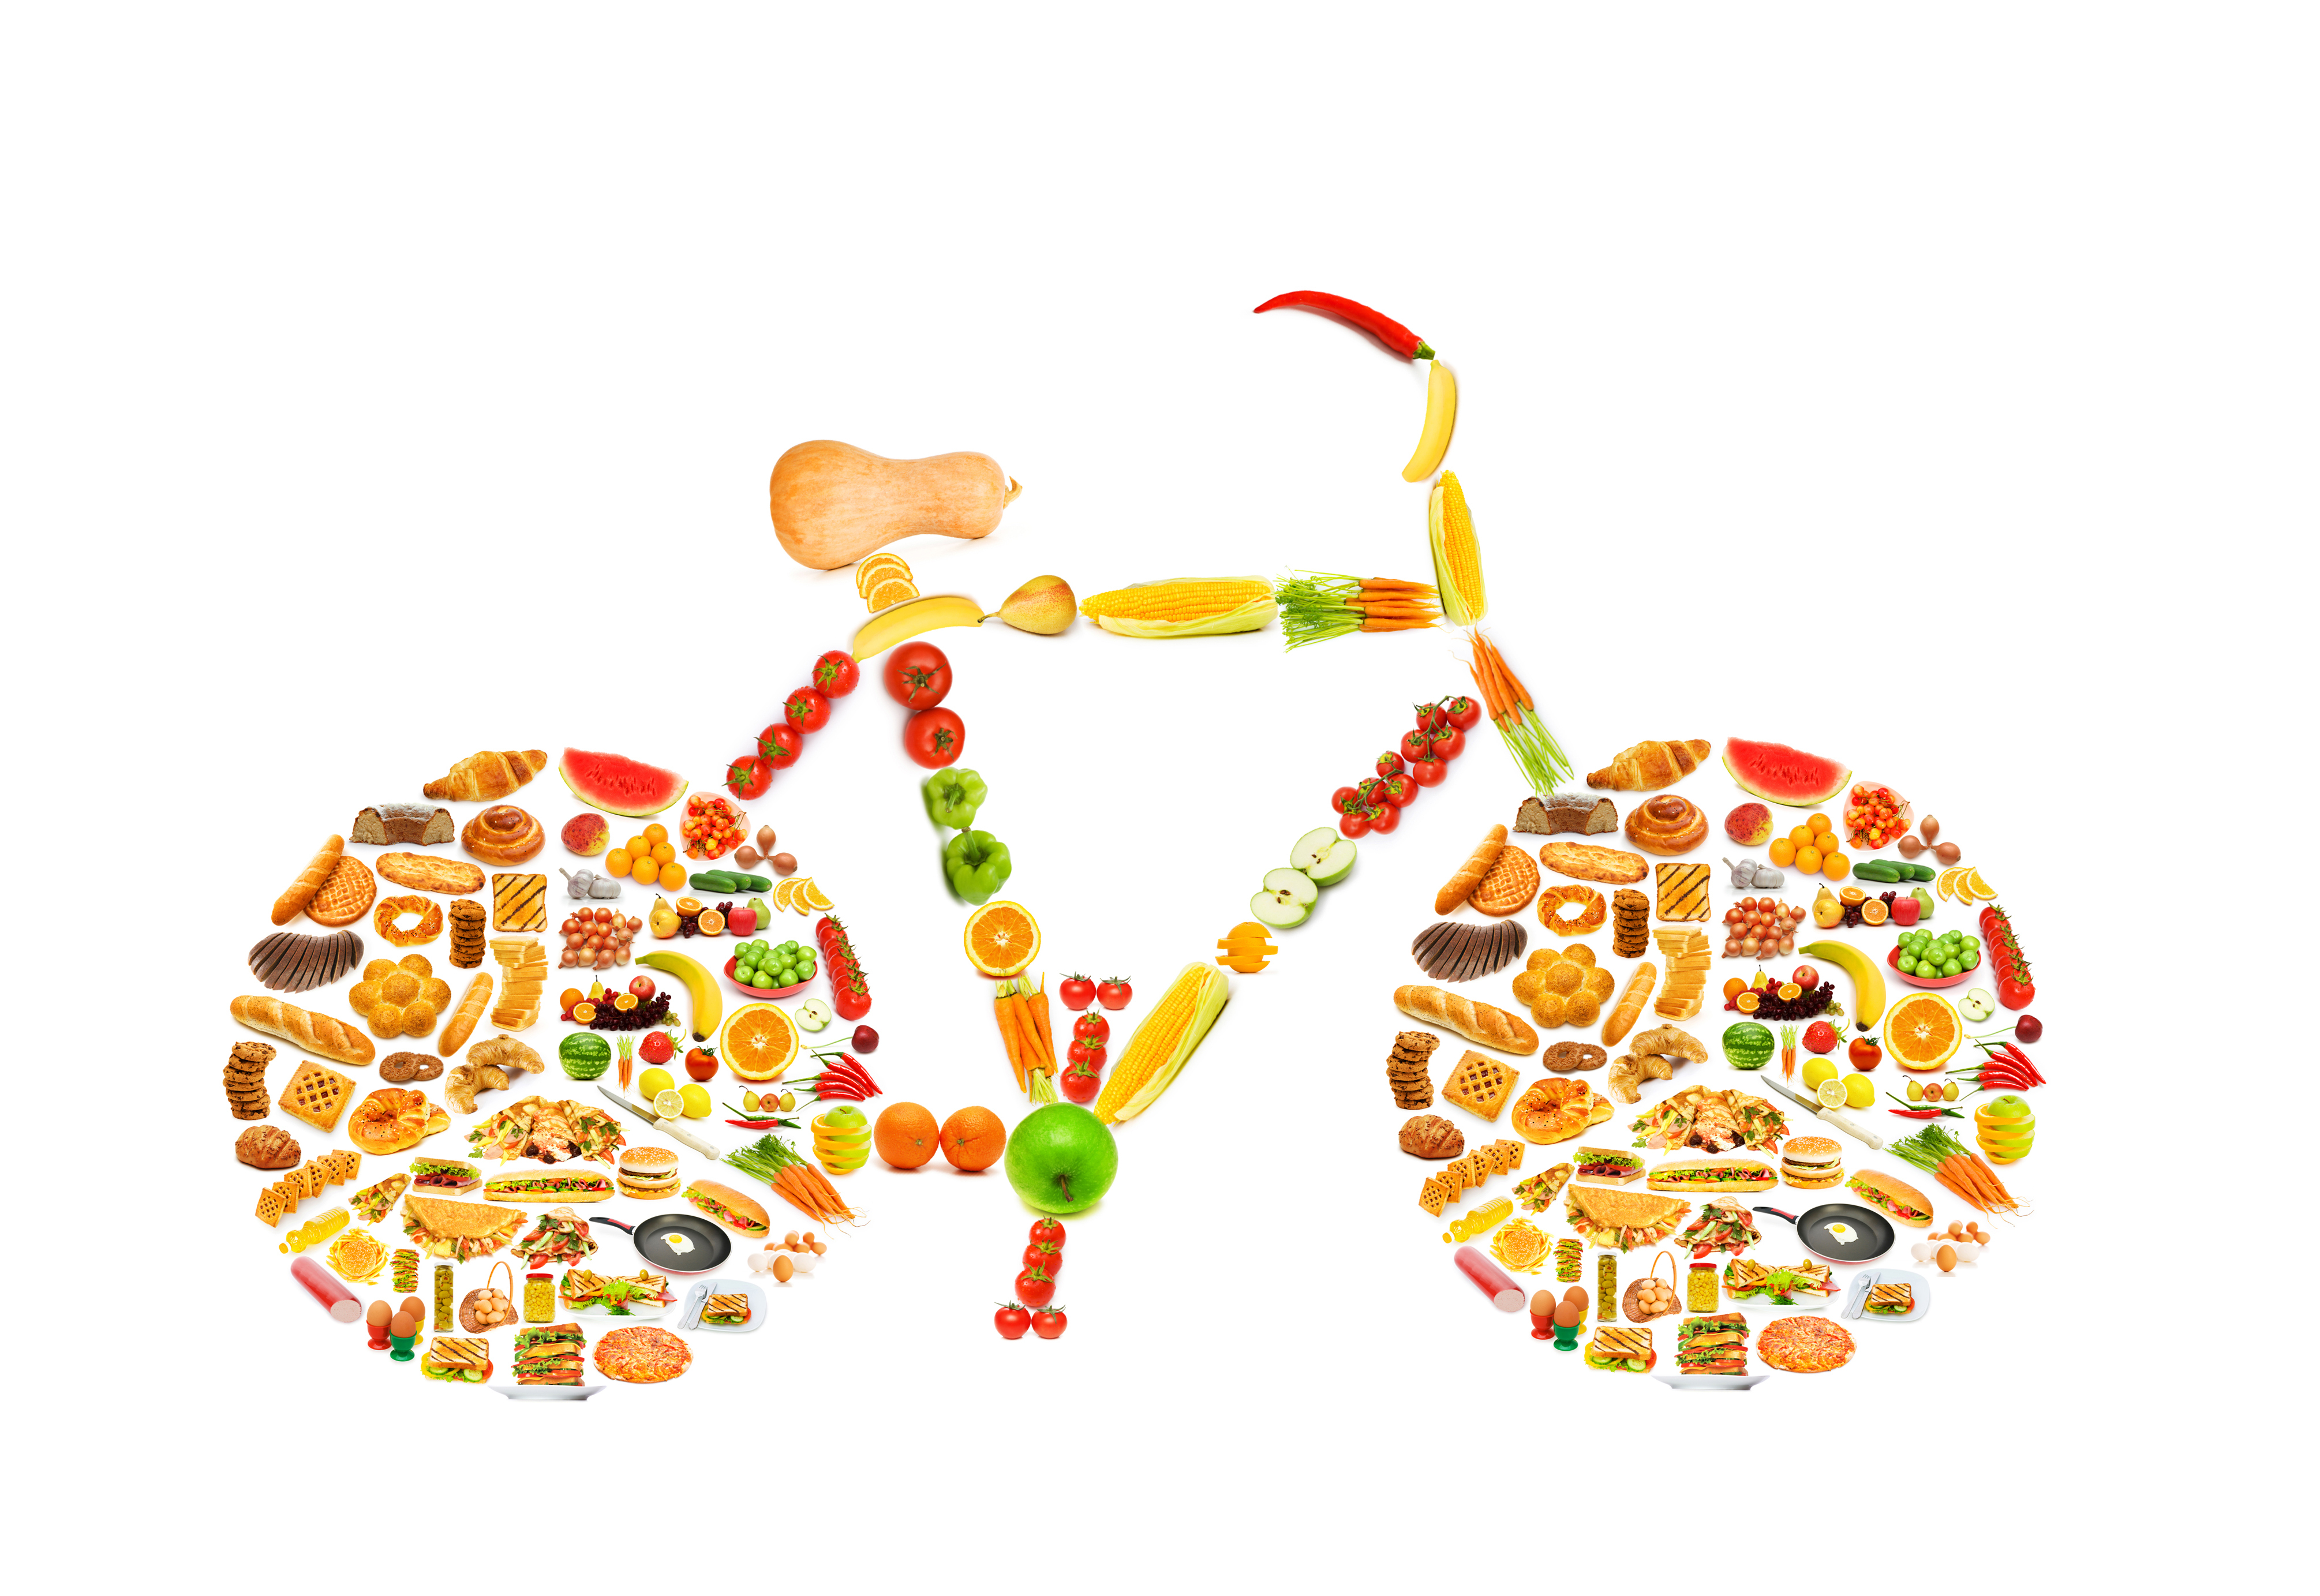 eco bike fuel and food